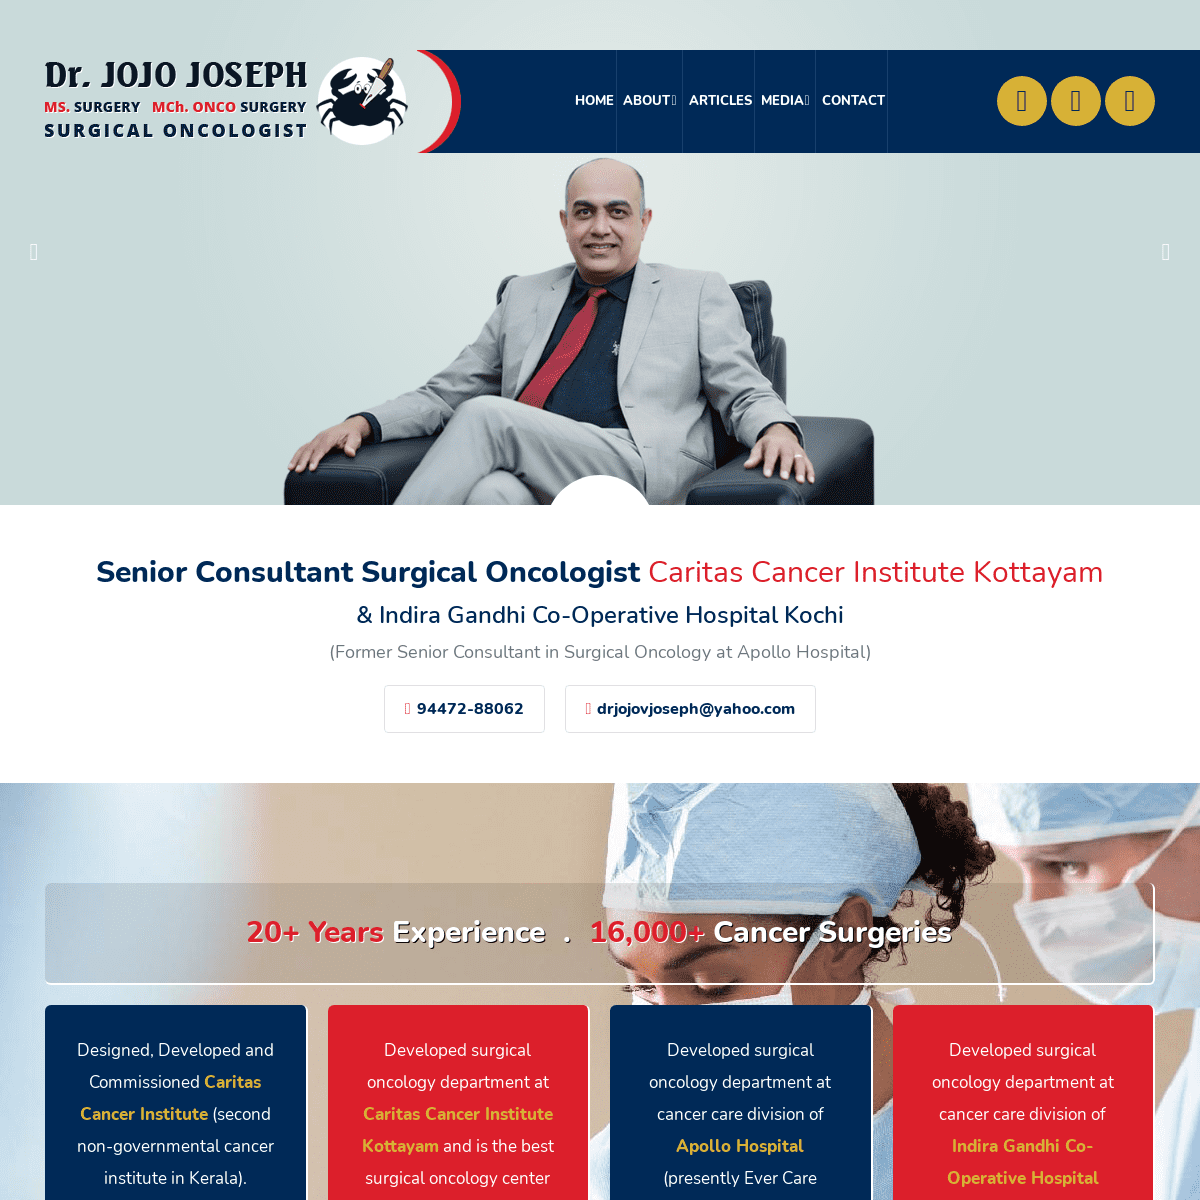 Dr. Jojo Joseph - MS. Surgery, MCh. ONCO Surgery